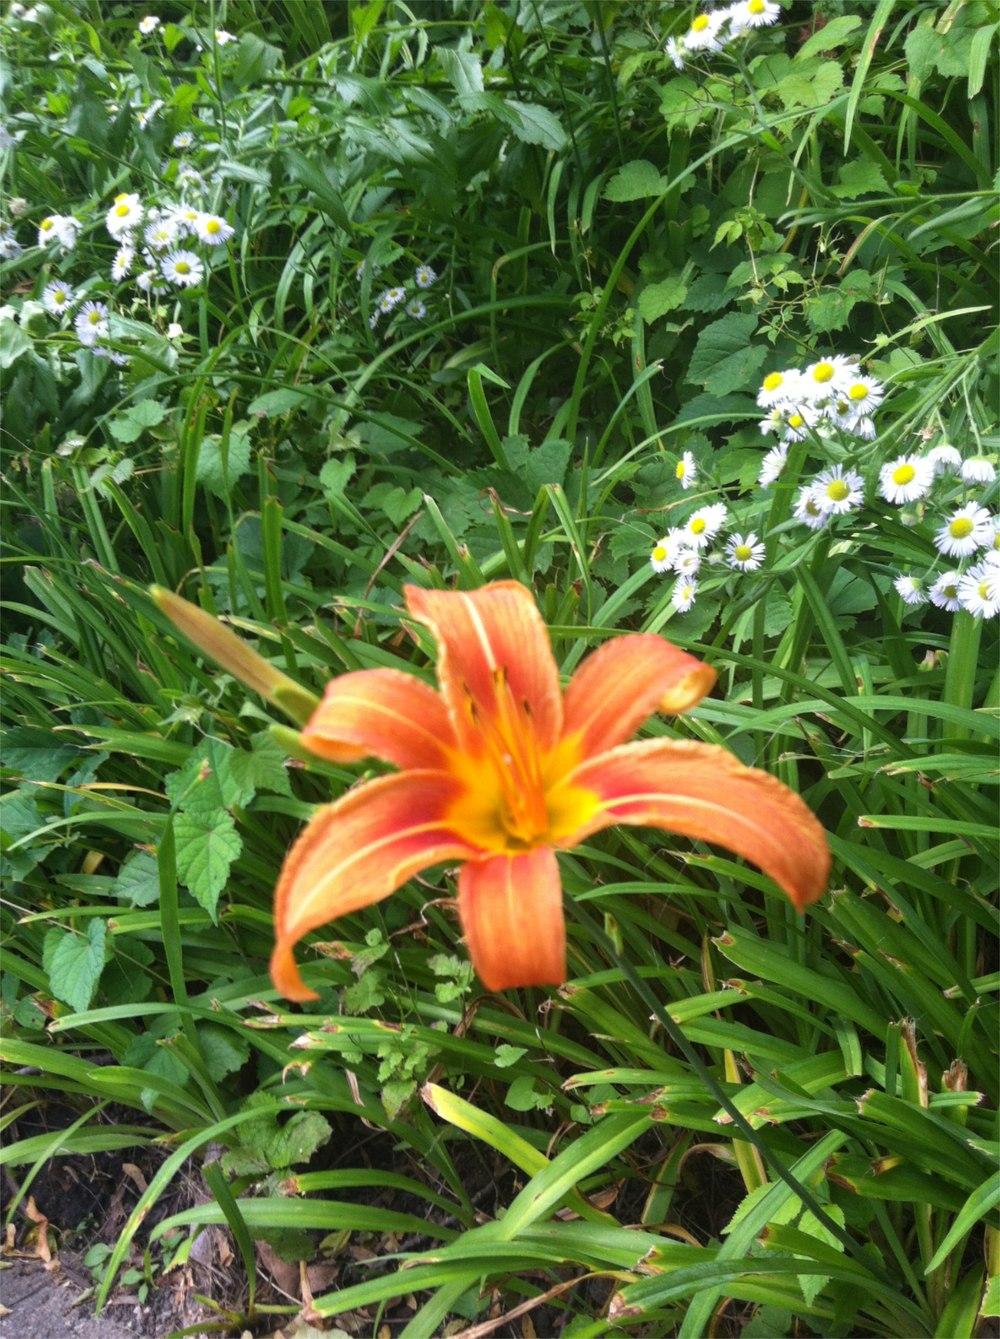 Orange day-lily